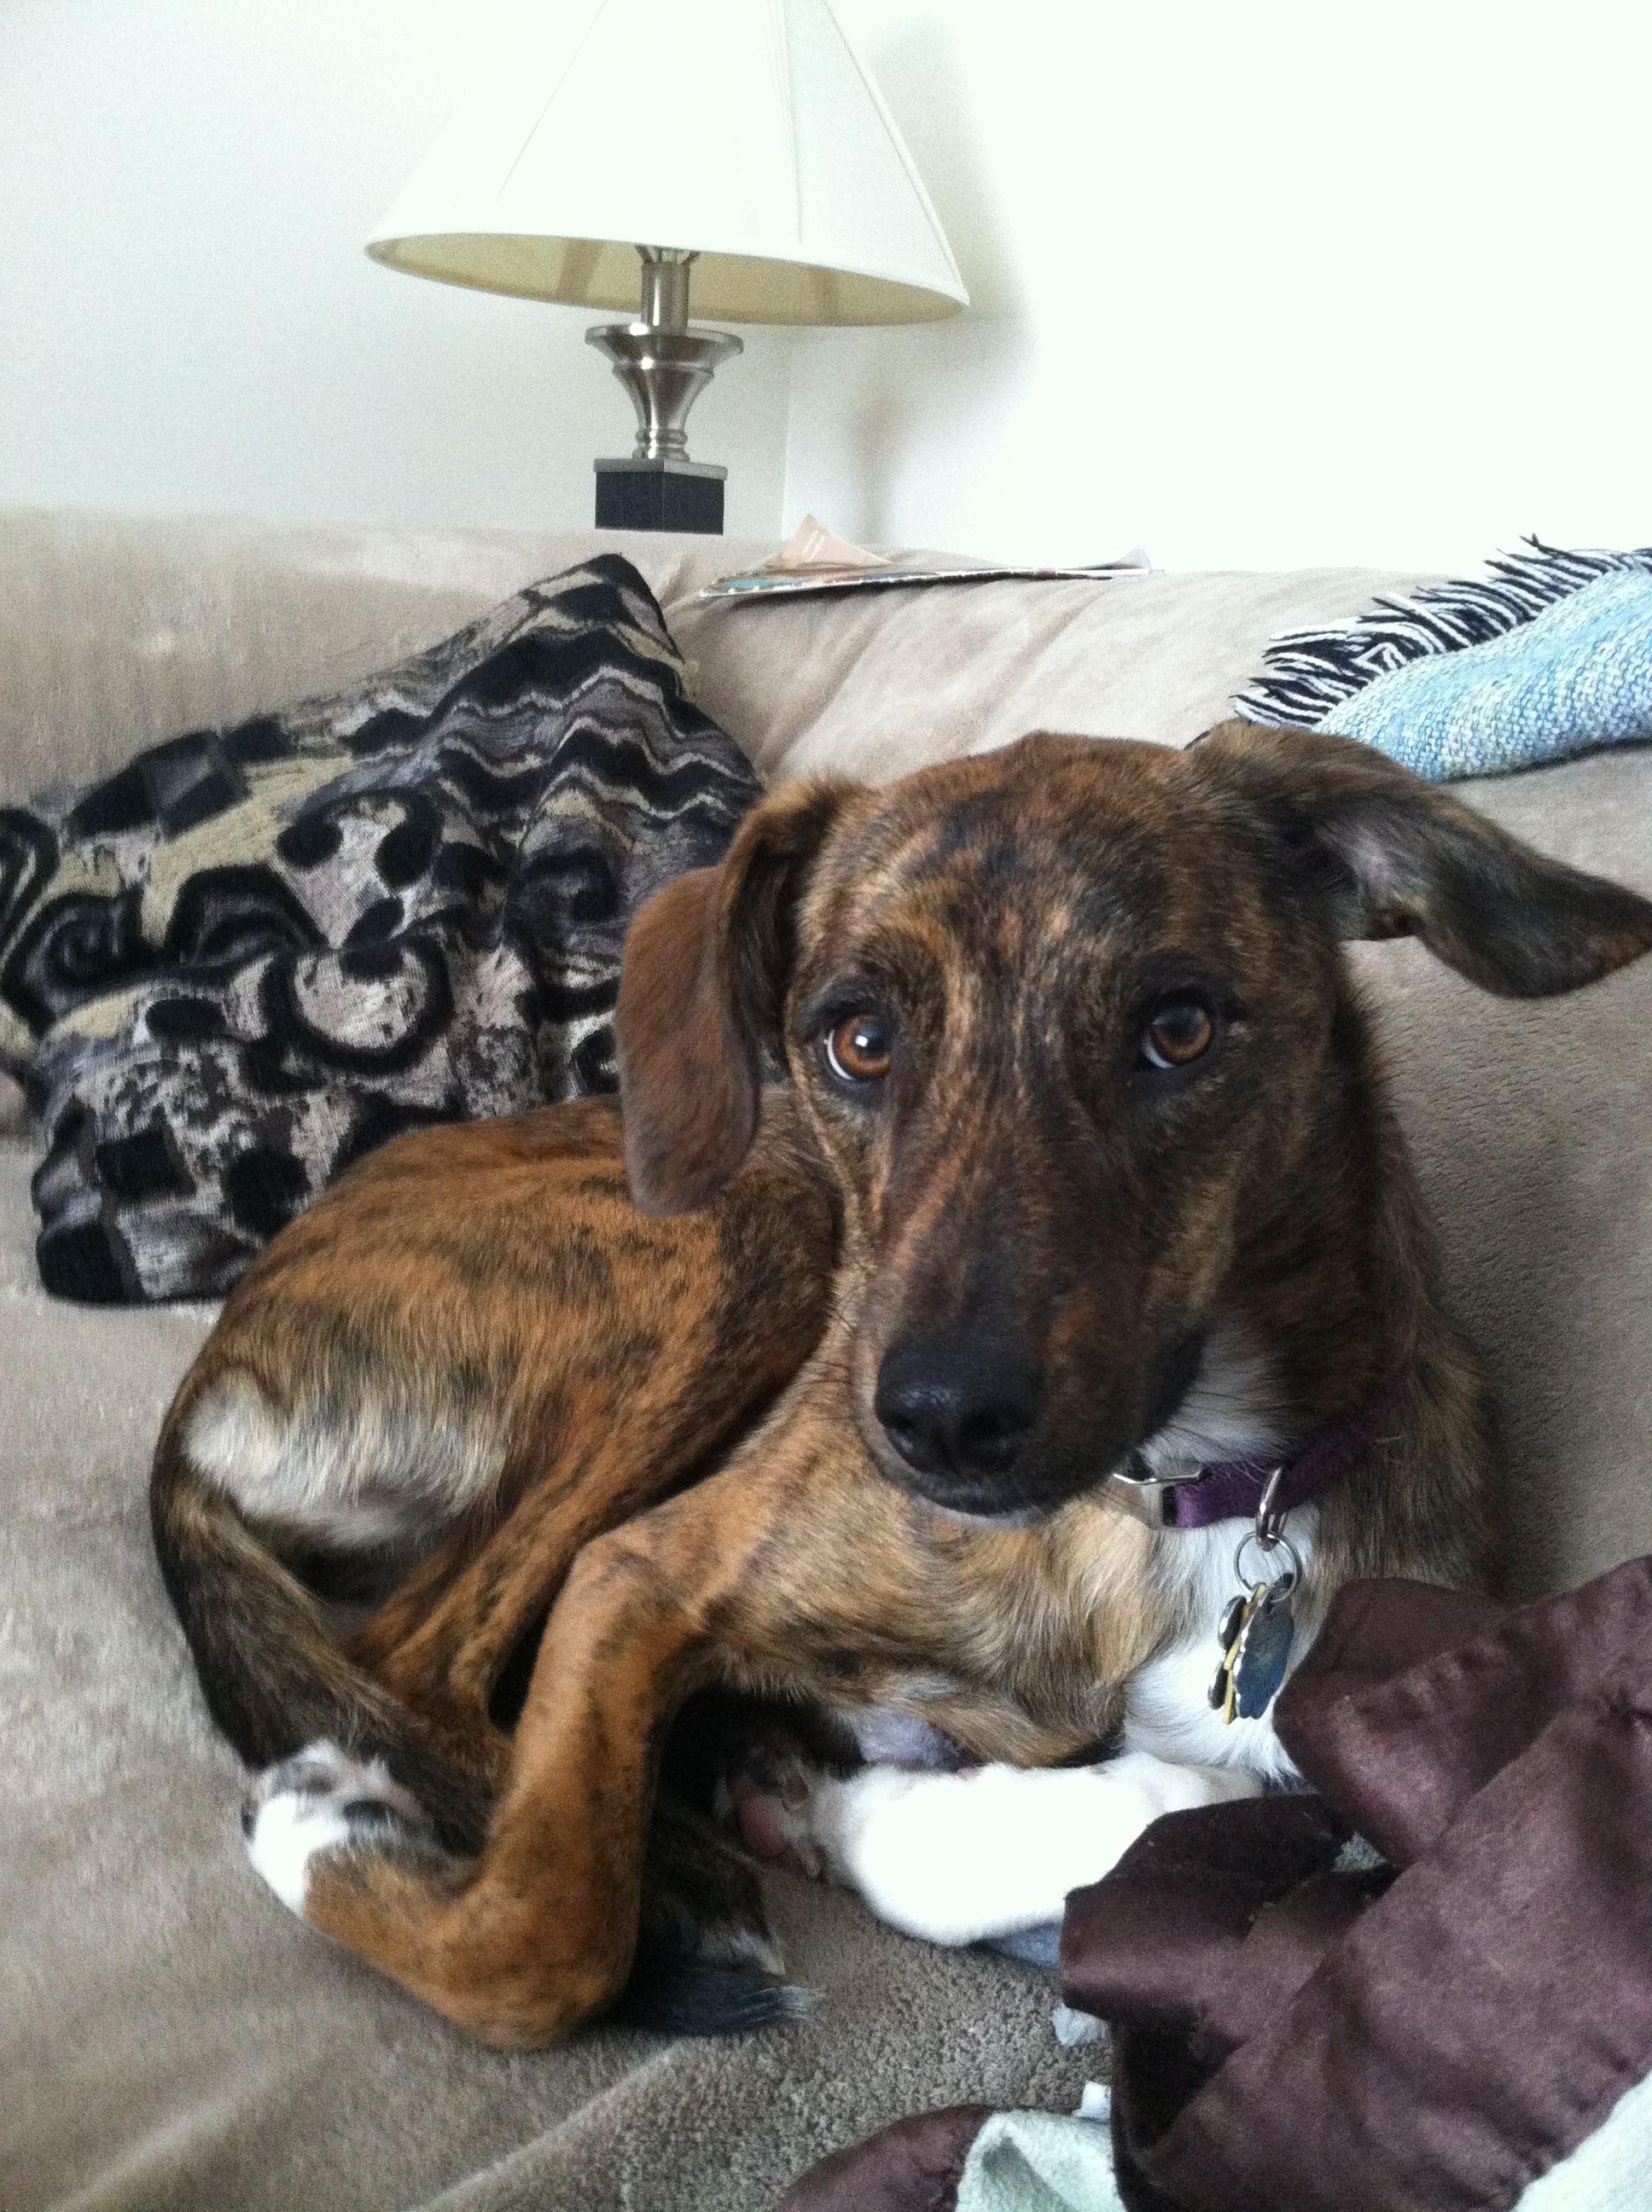 Amy the Plott hound from Cincinnati #plotthound